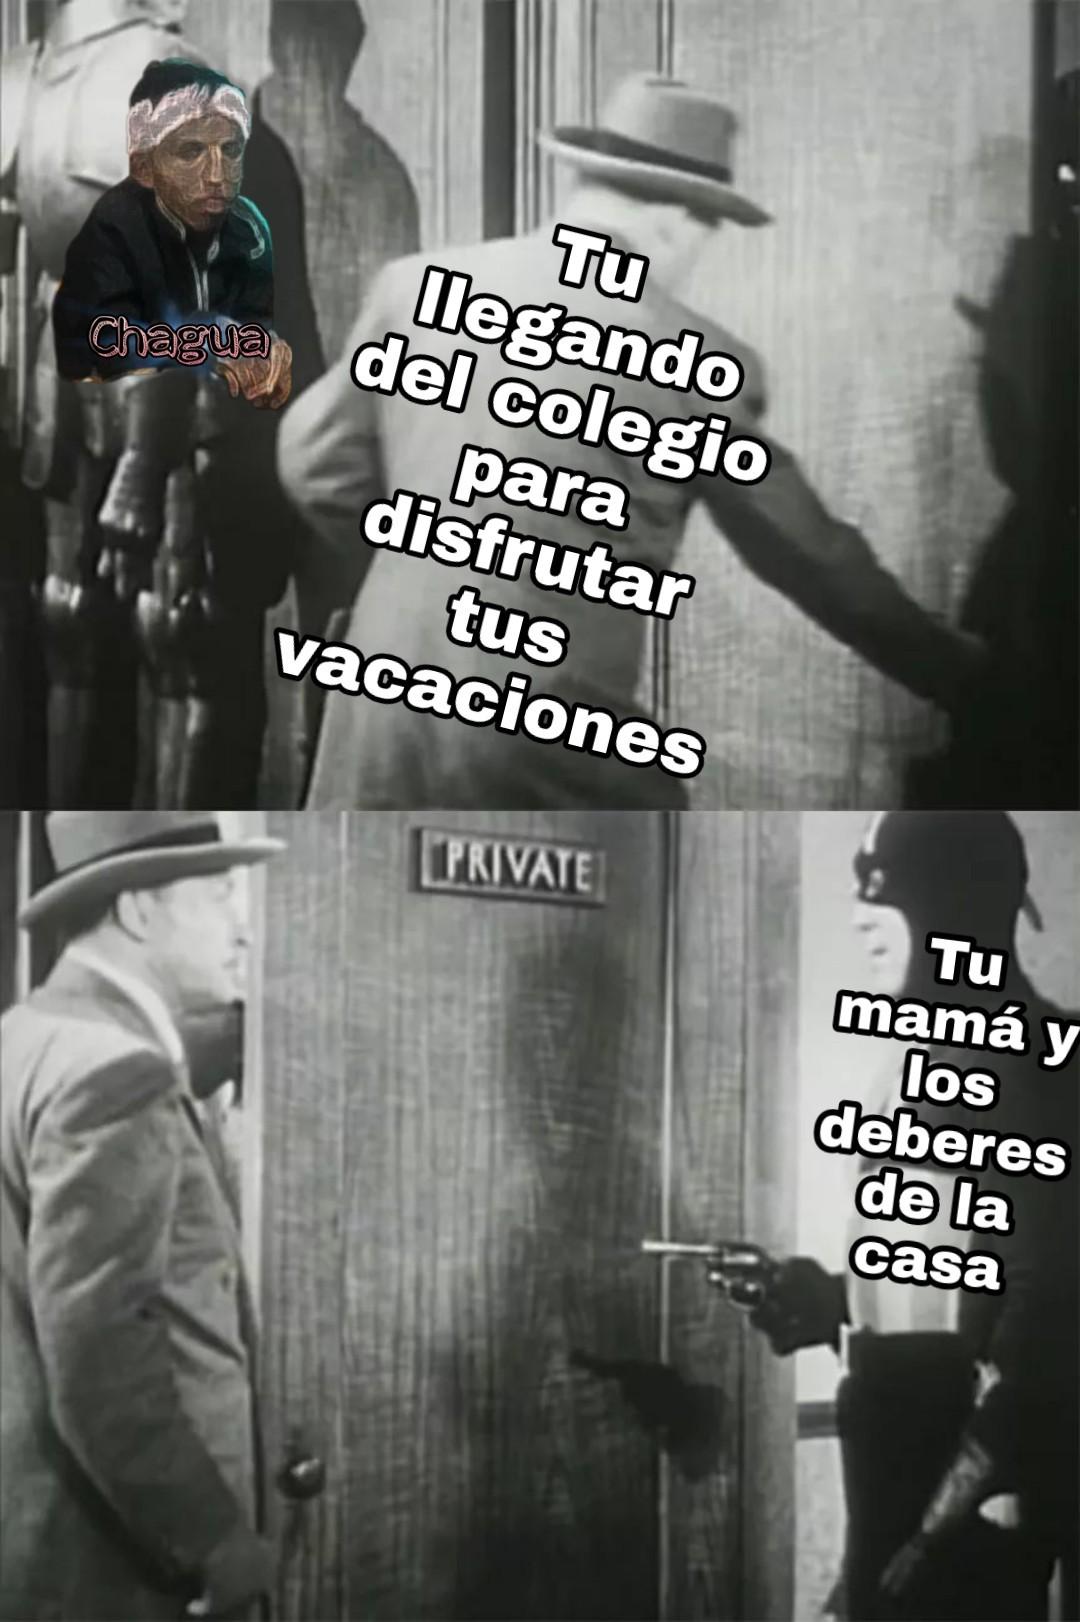 Meme adelantado :3